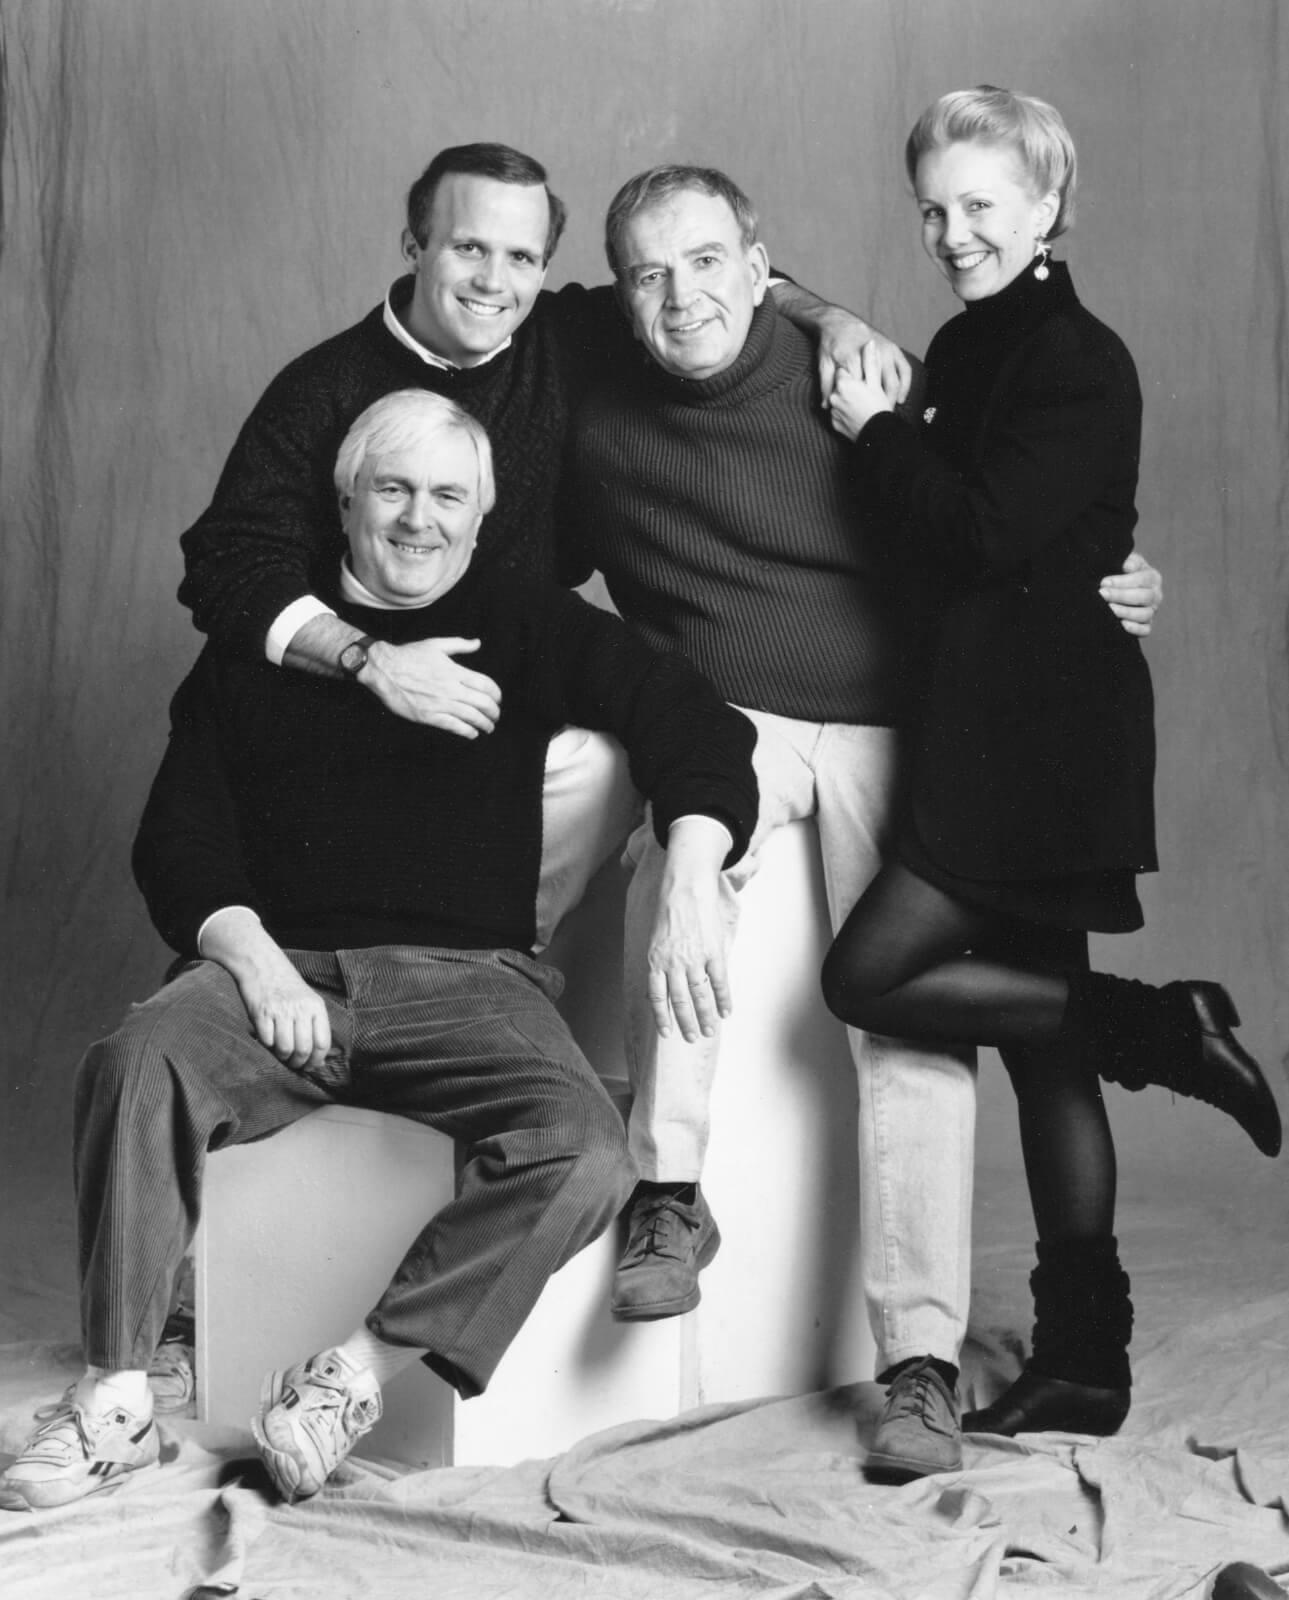 Black and white press photo of the creative team John Kander, Scott Ellis, Fred Ebb and Susan Stroman